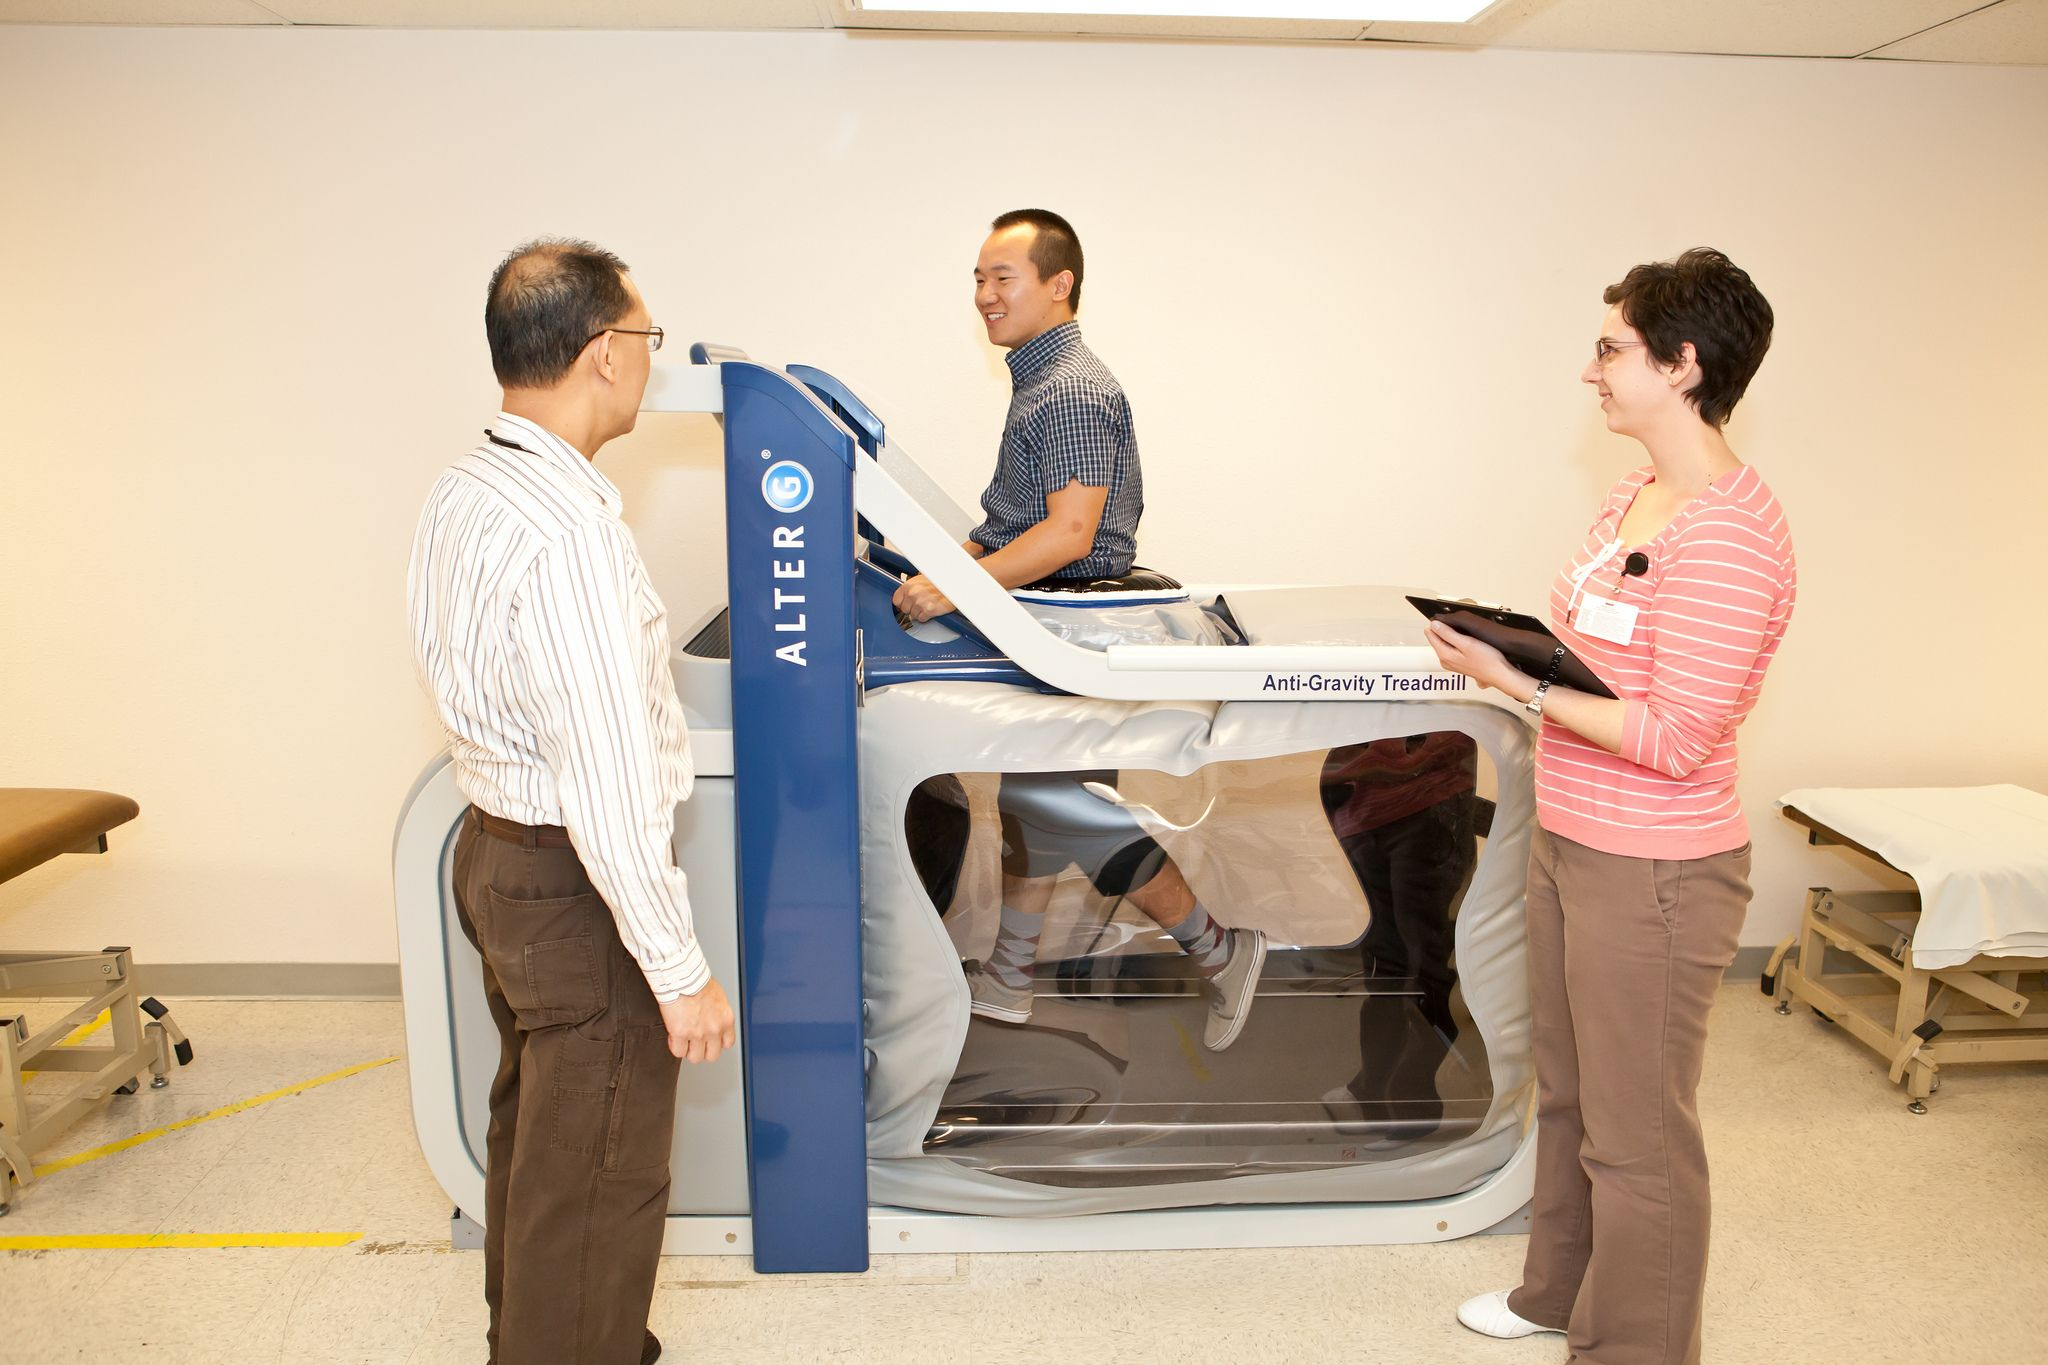 Hospital Treadmill